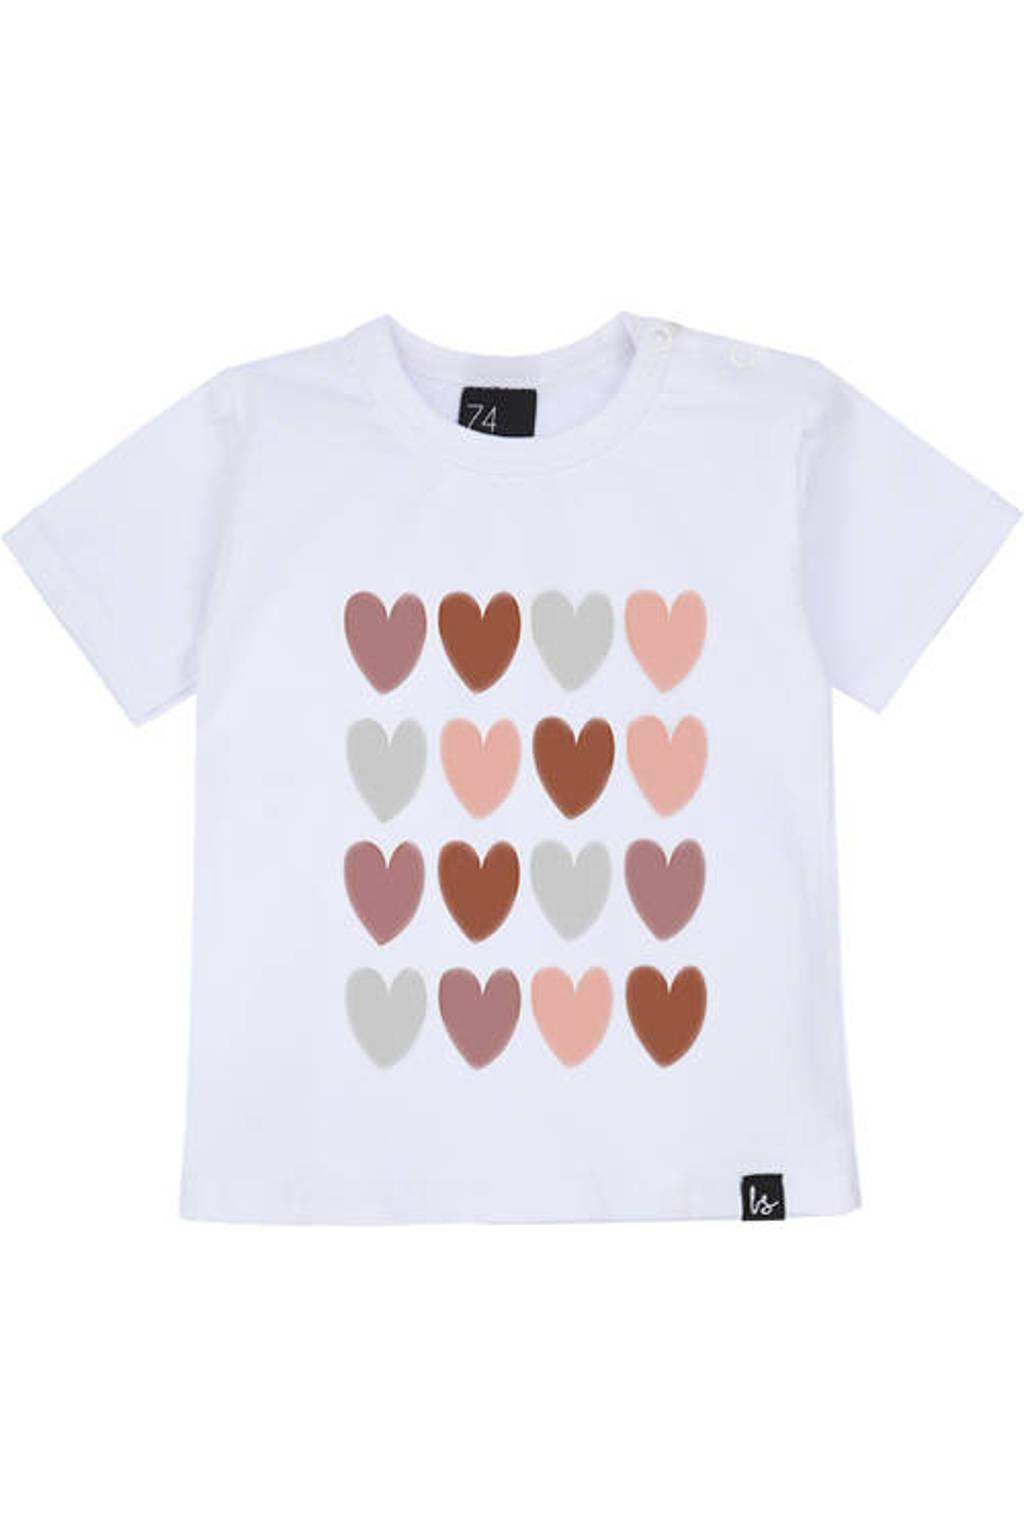 Babystyling T-shirt met hartjes wit/roze/grijs, Wit/roze/grijs